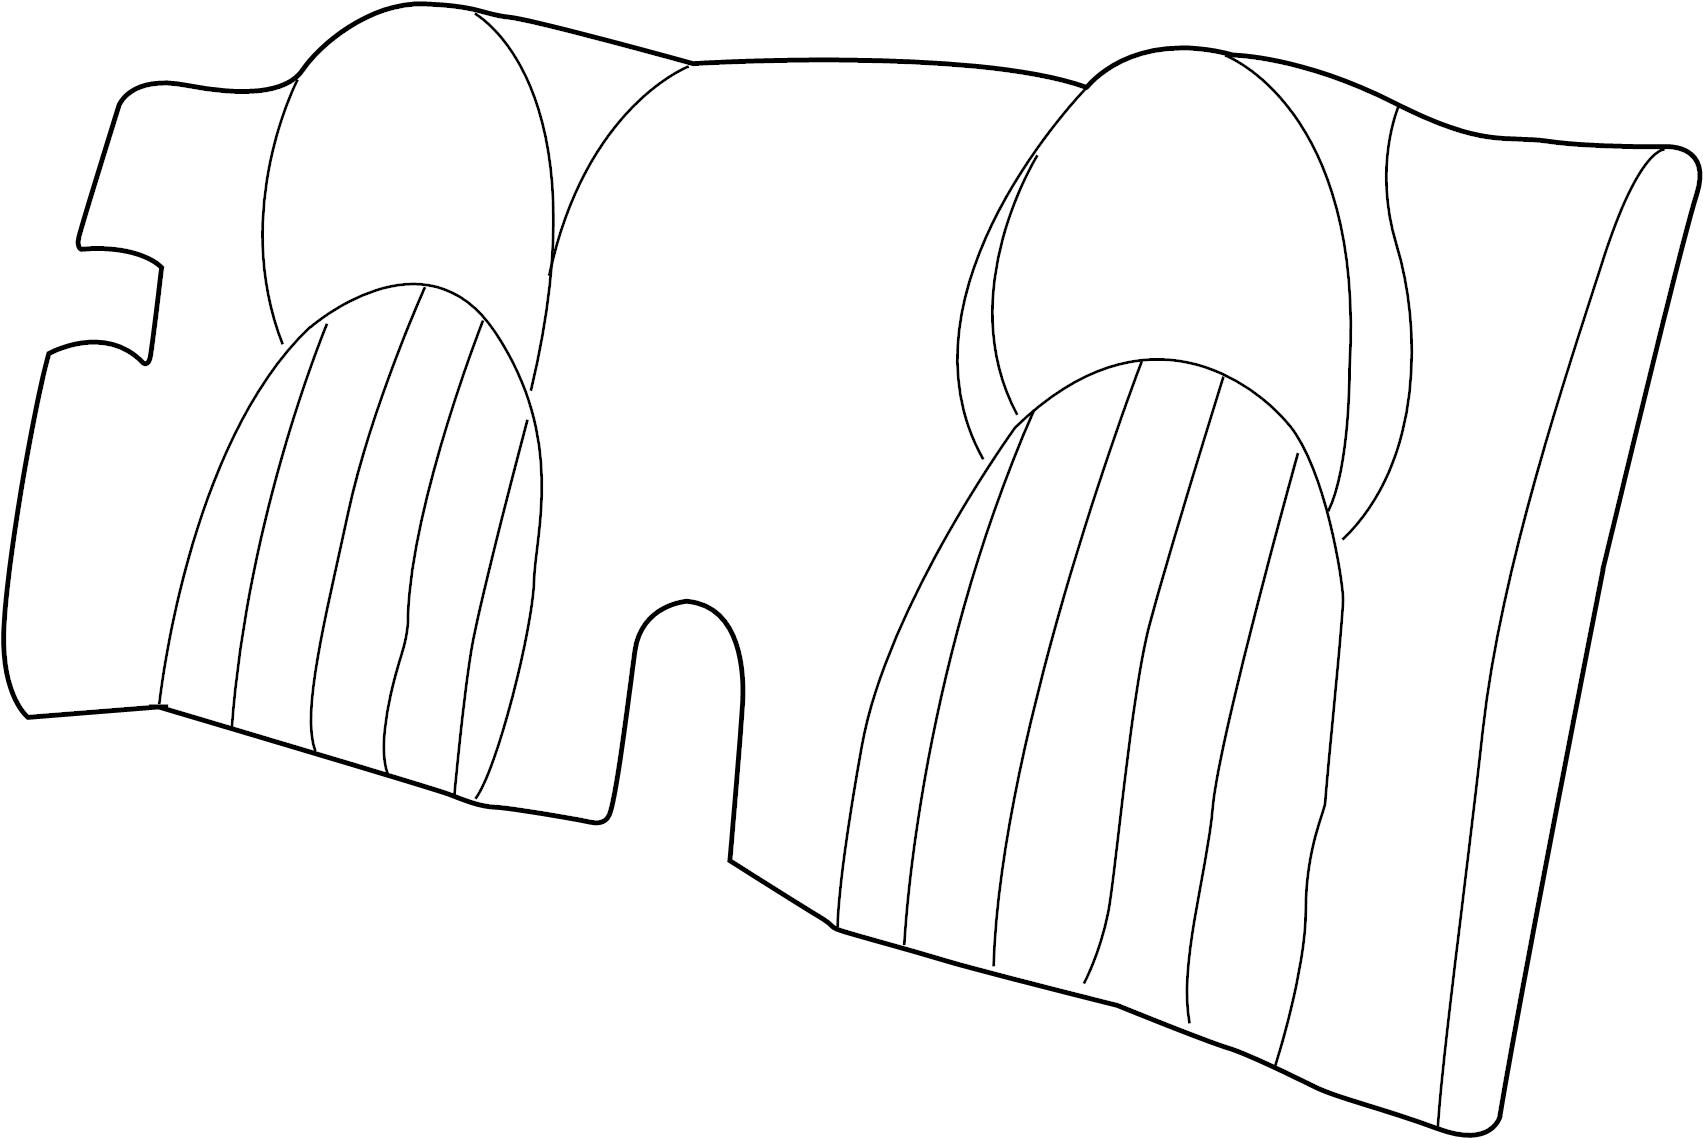 jaguar xk8 seat back assembly  convertible  classic seat  cashmere